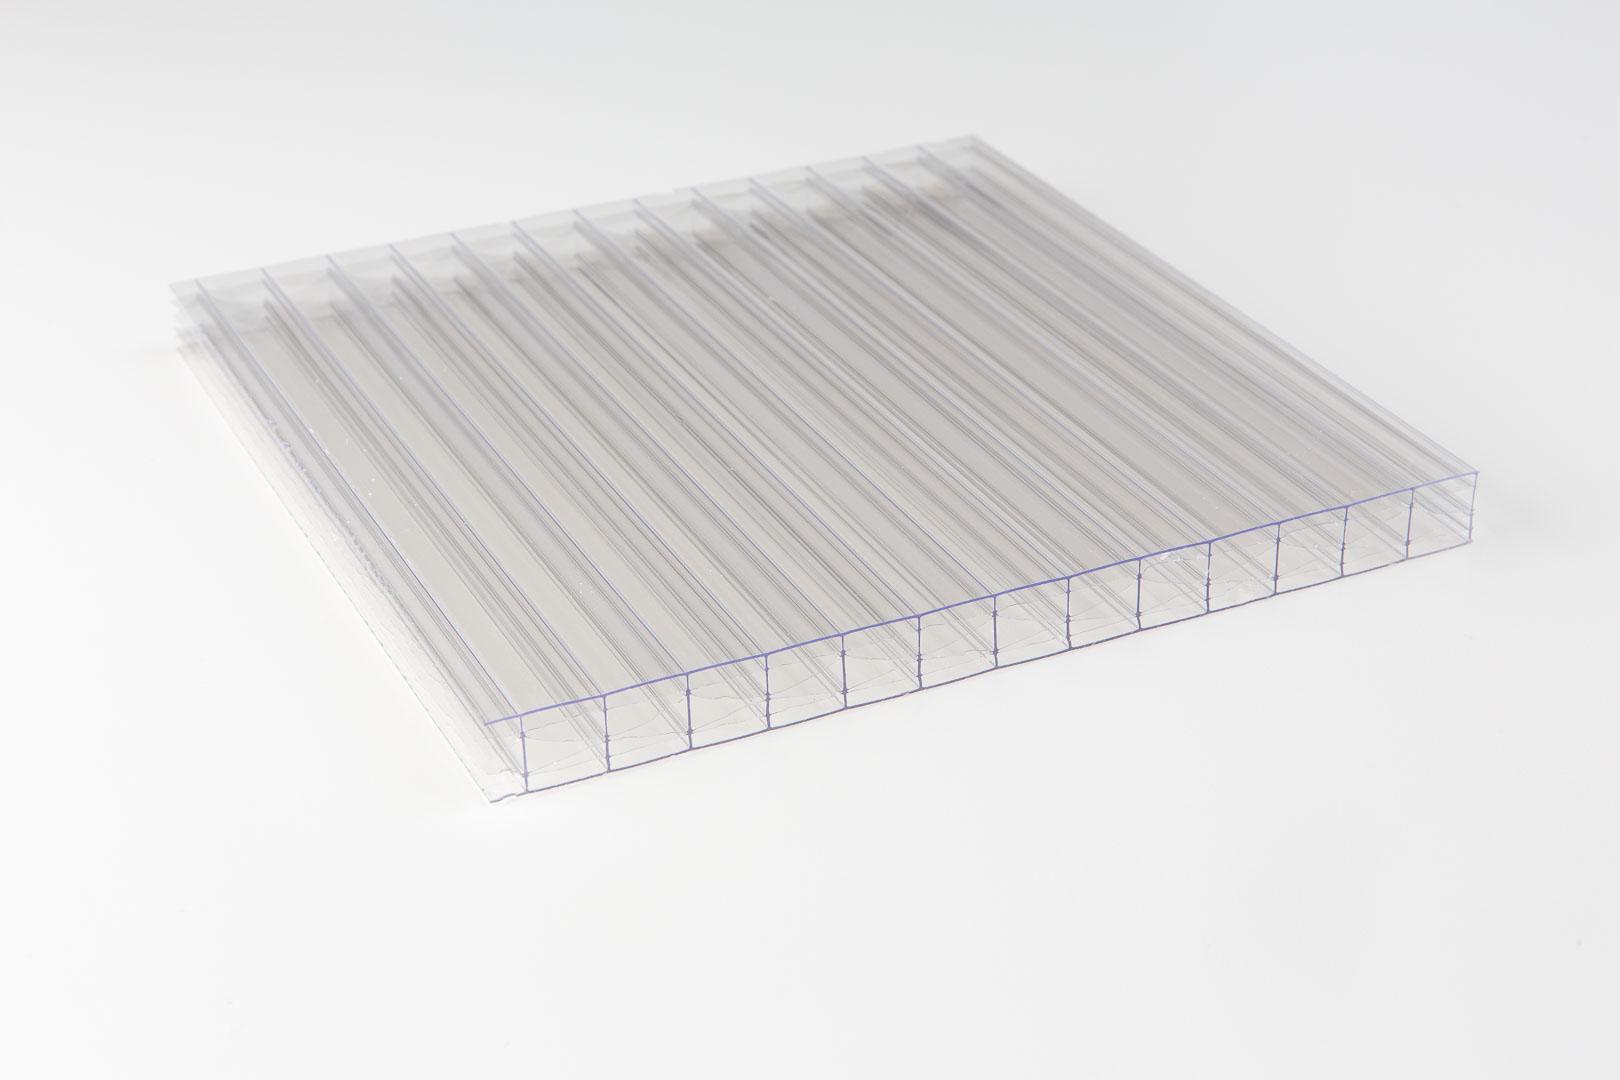 Polycarbonat 16mm X-Struktur klar